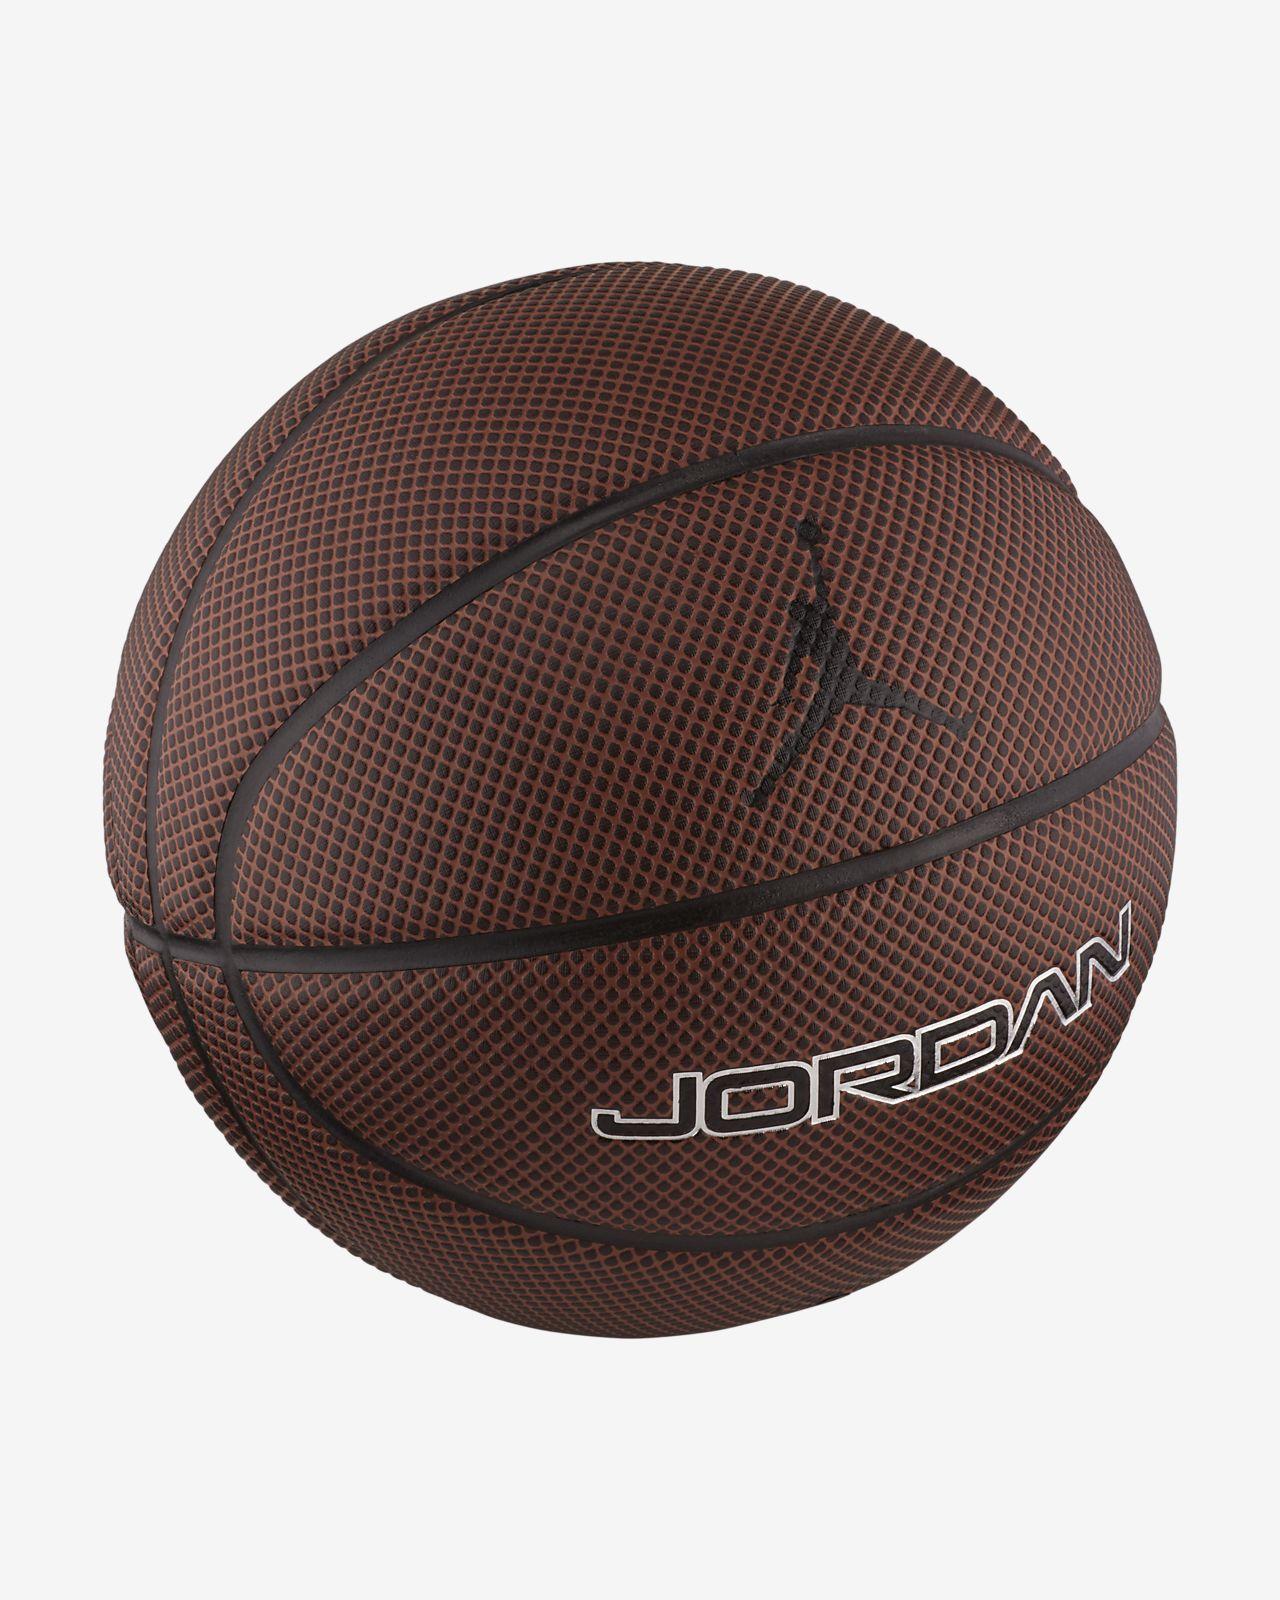 Jordan Legacy 8P (7 號) 籃球